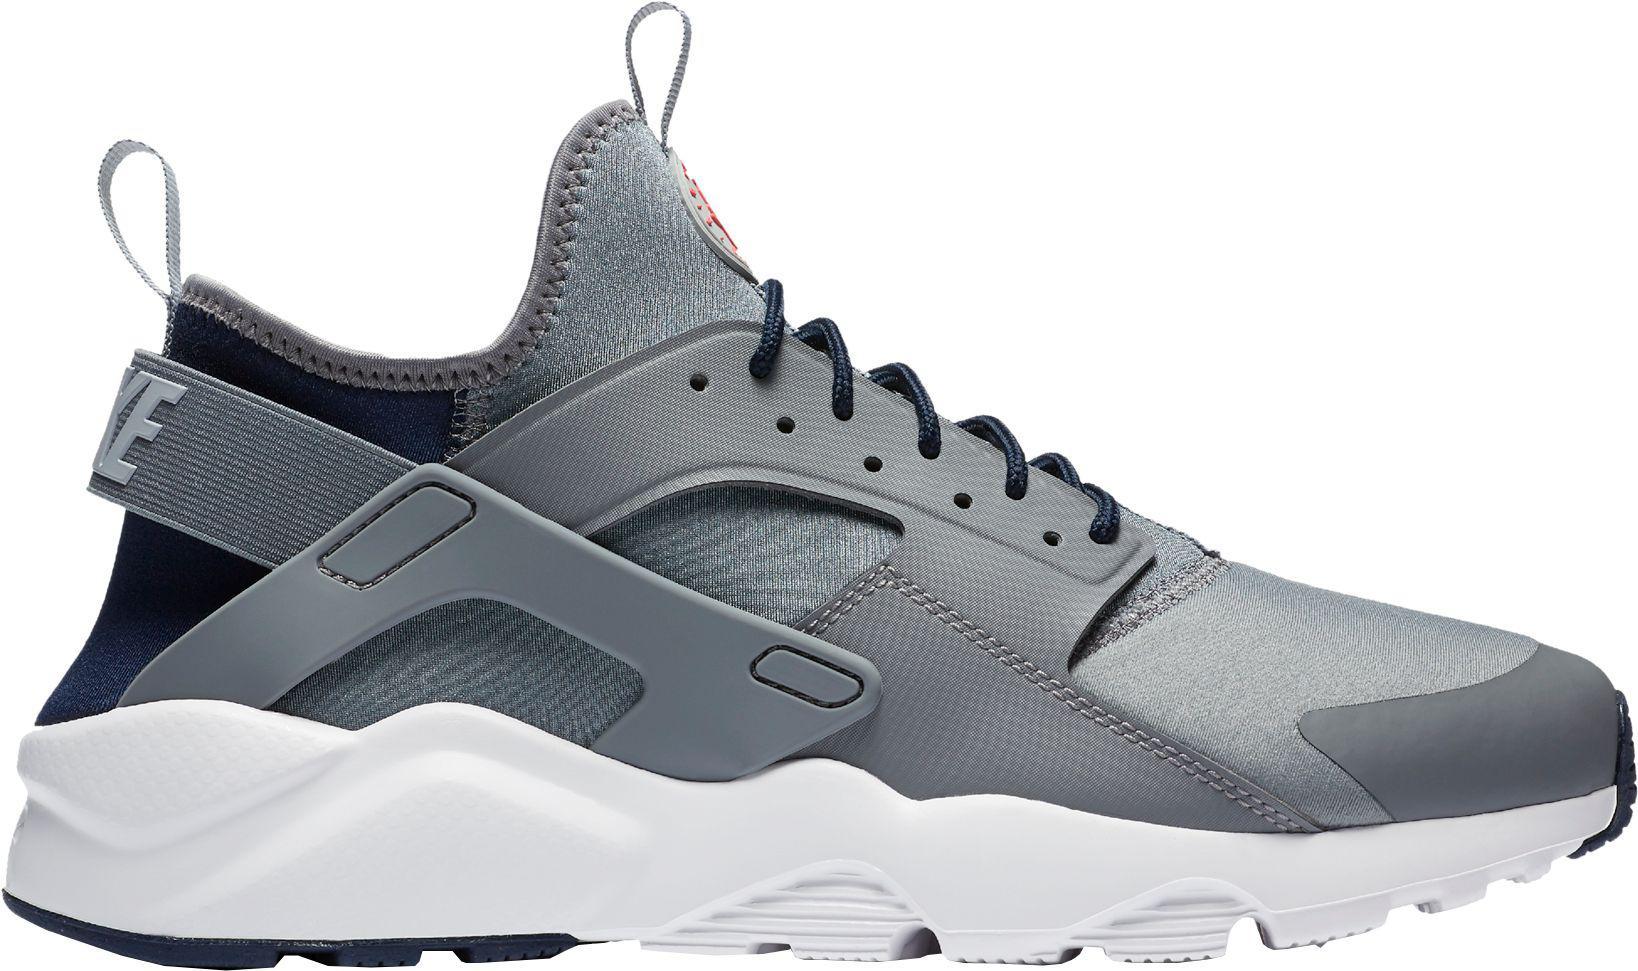 72aaf65ef55af Lyst - Nike Air Huarache Run Ultra Shoes in Gray for Men